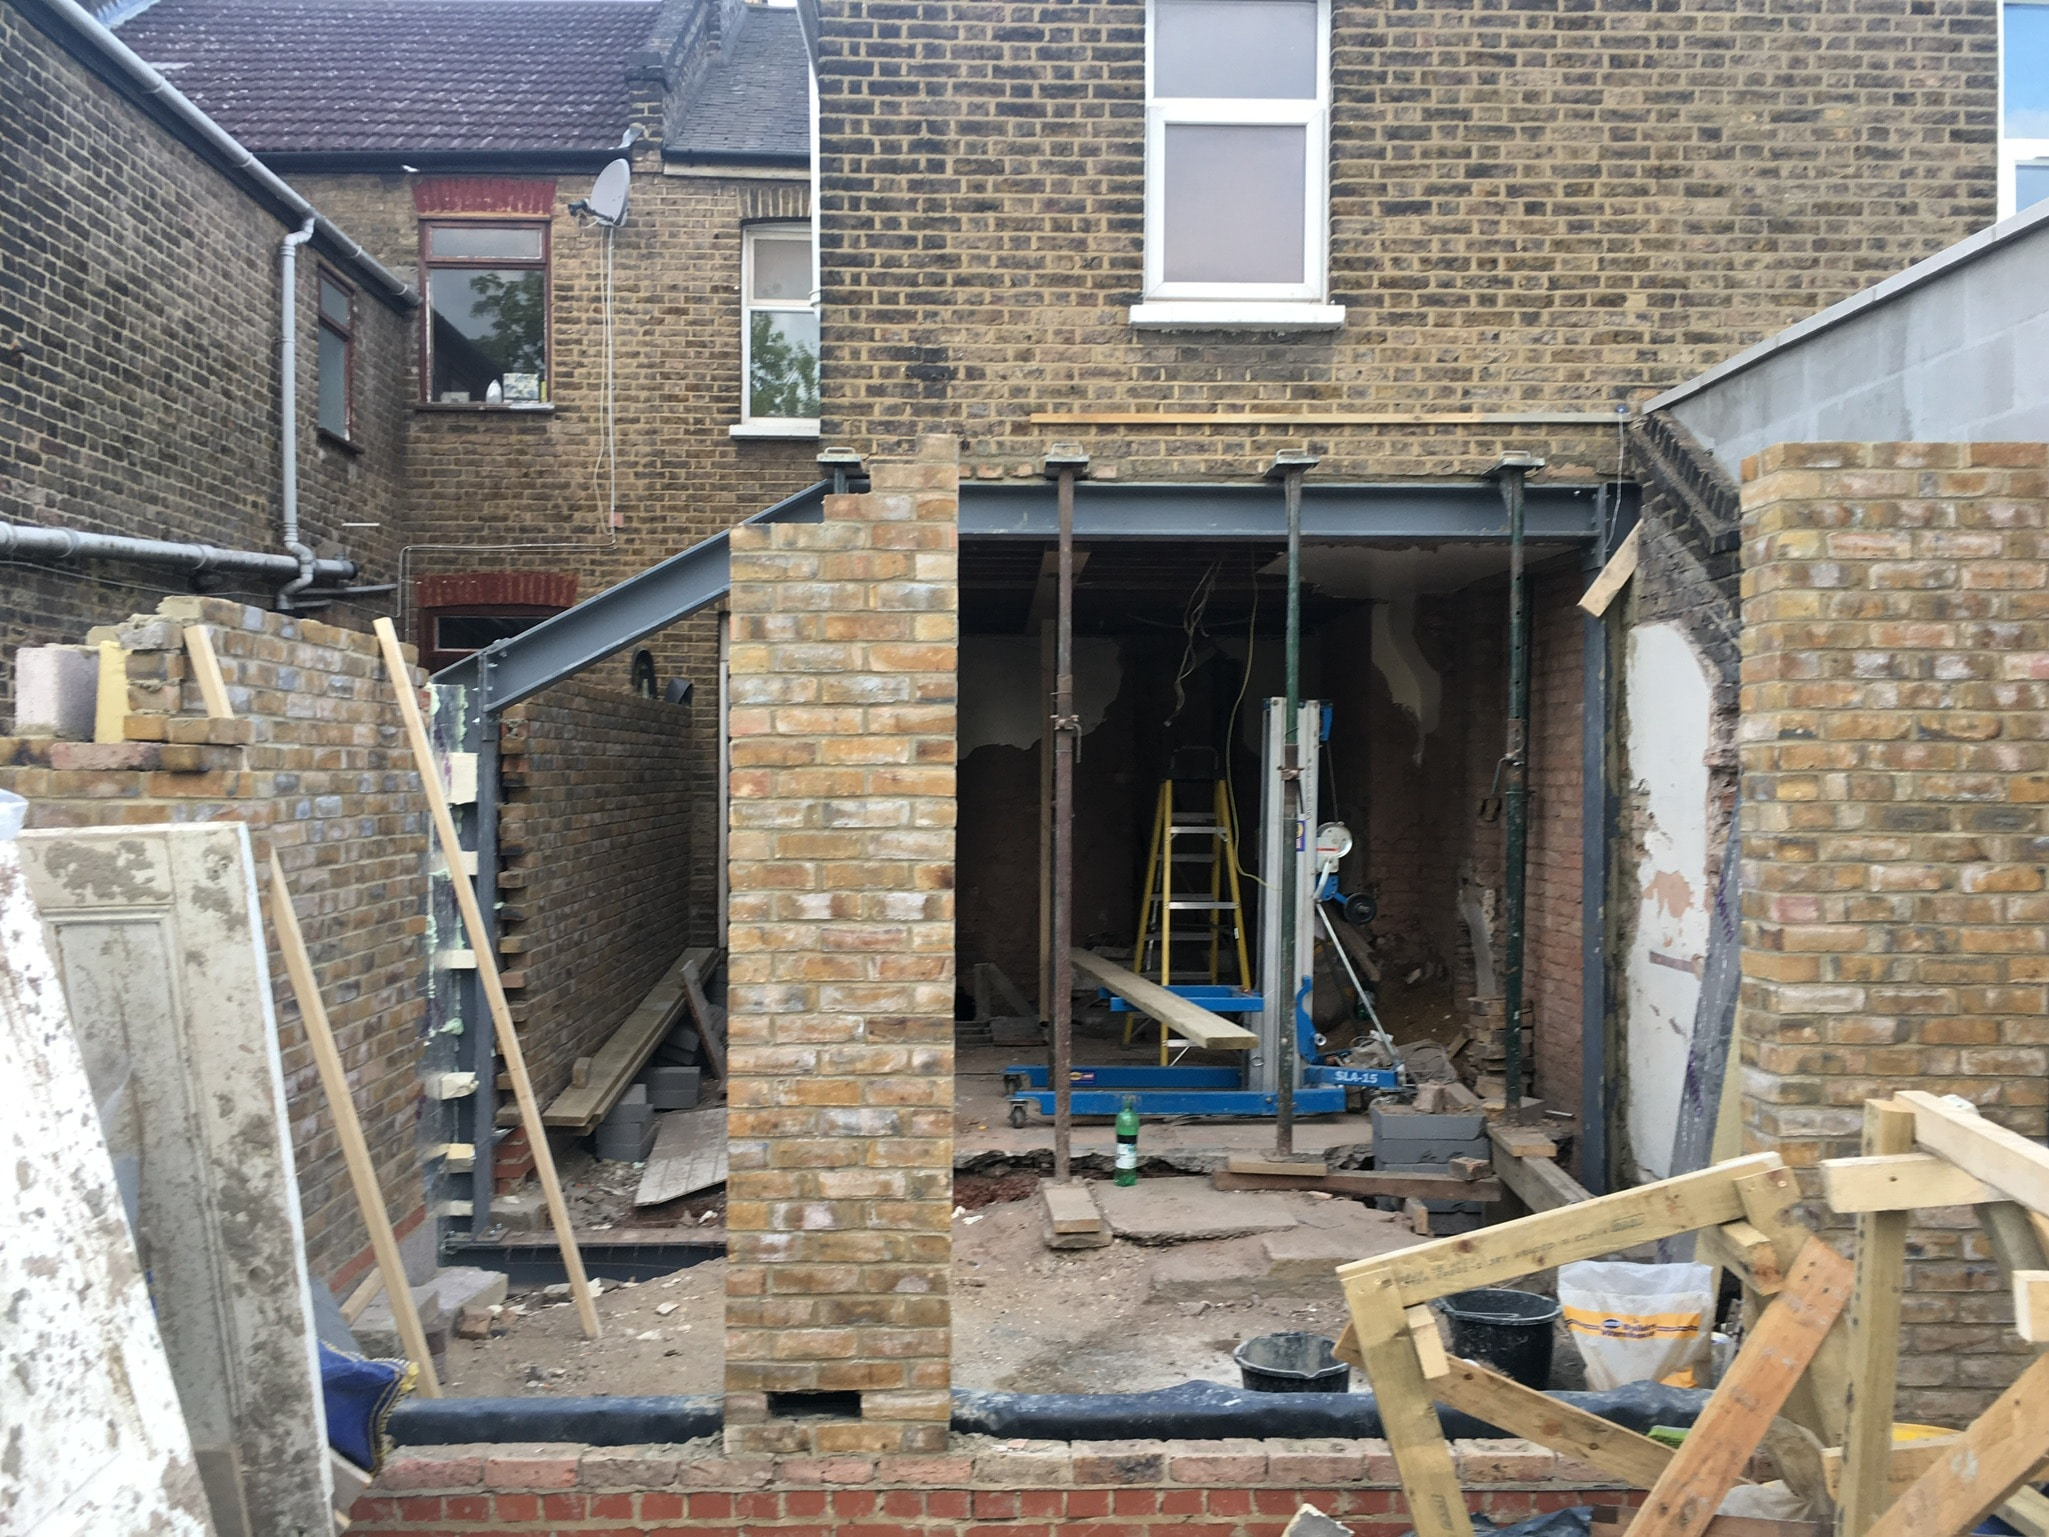 Brickwork for full width rear extension